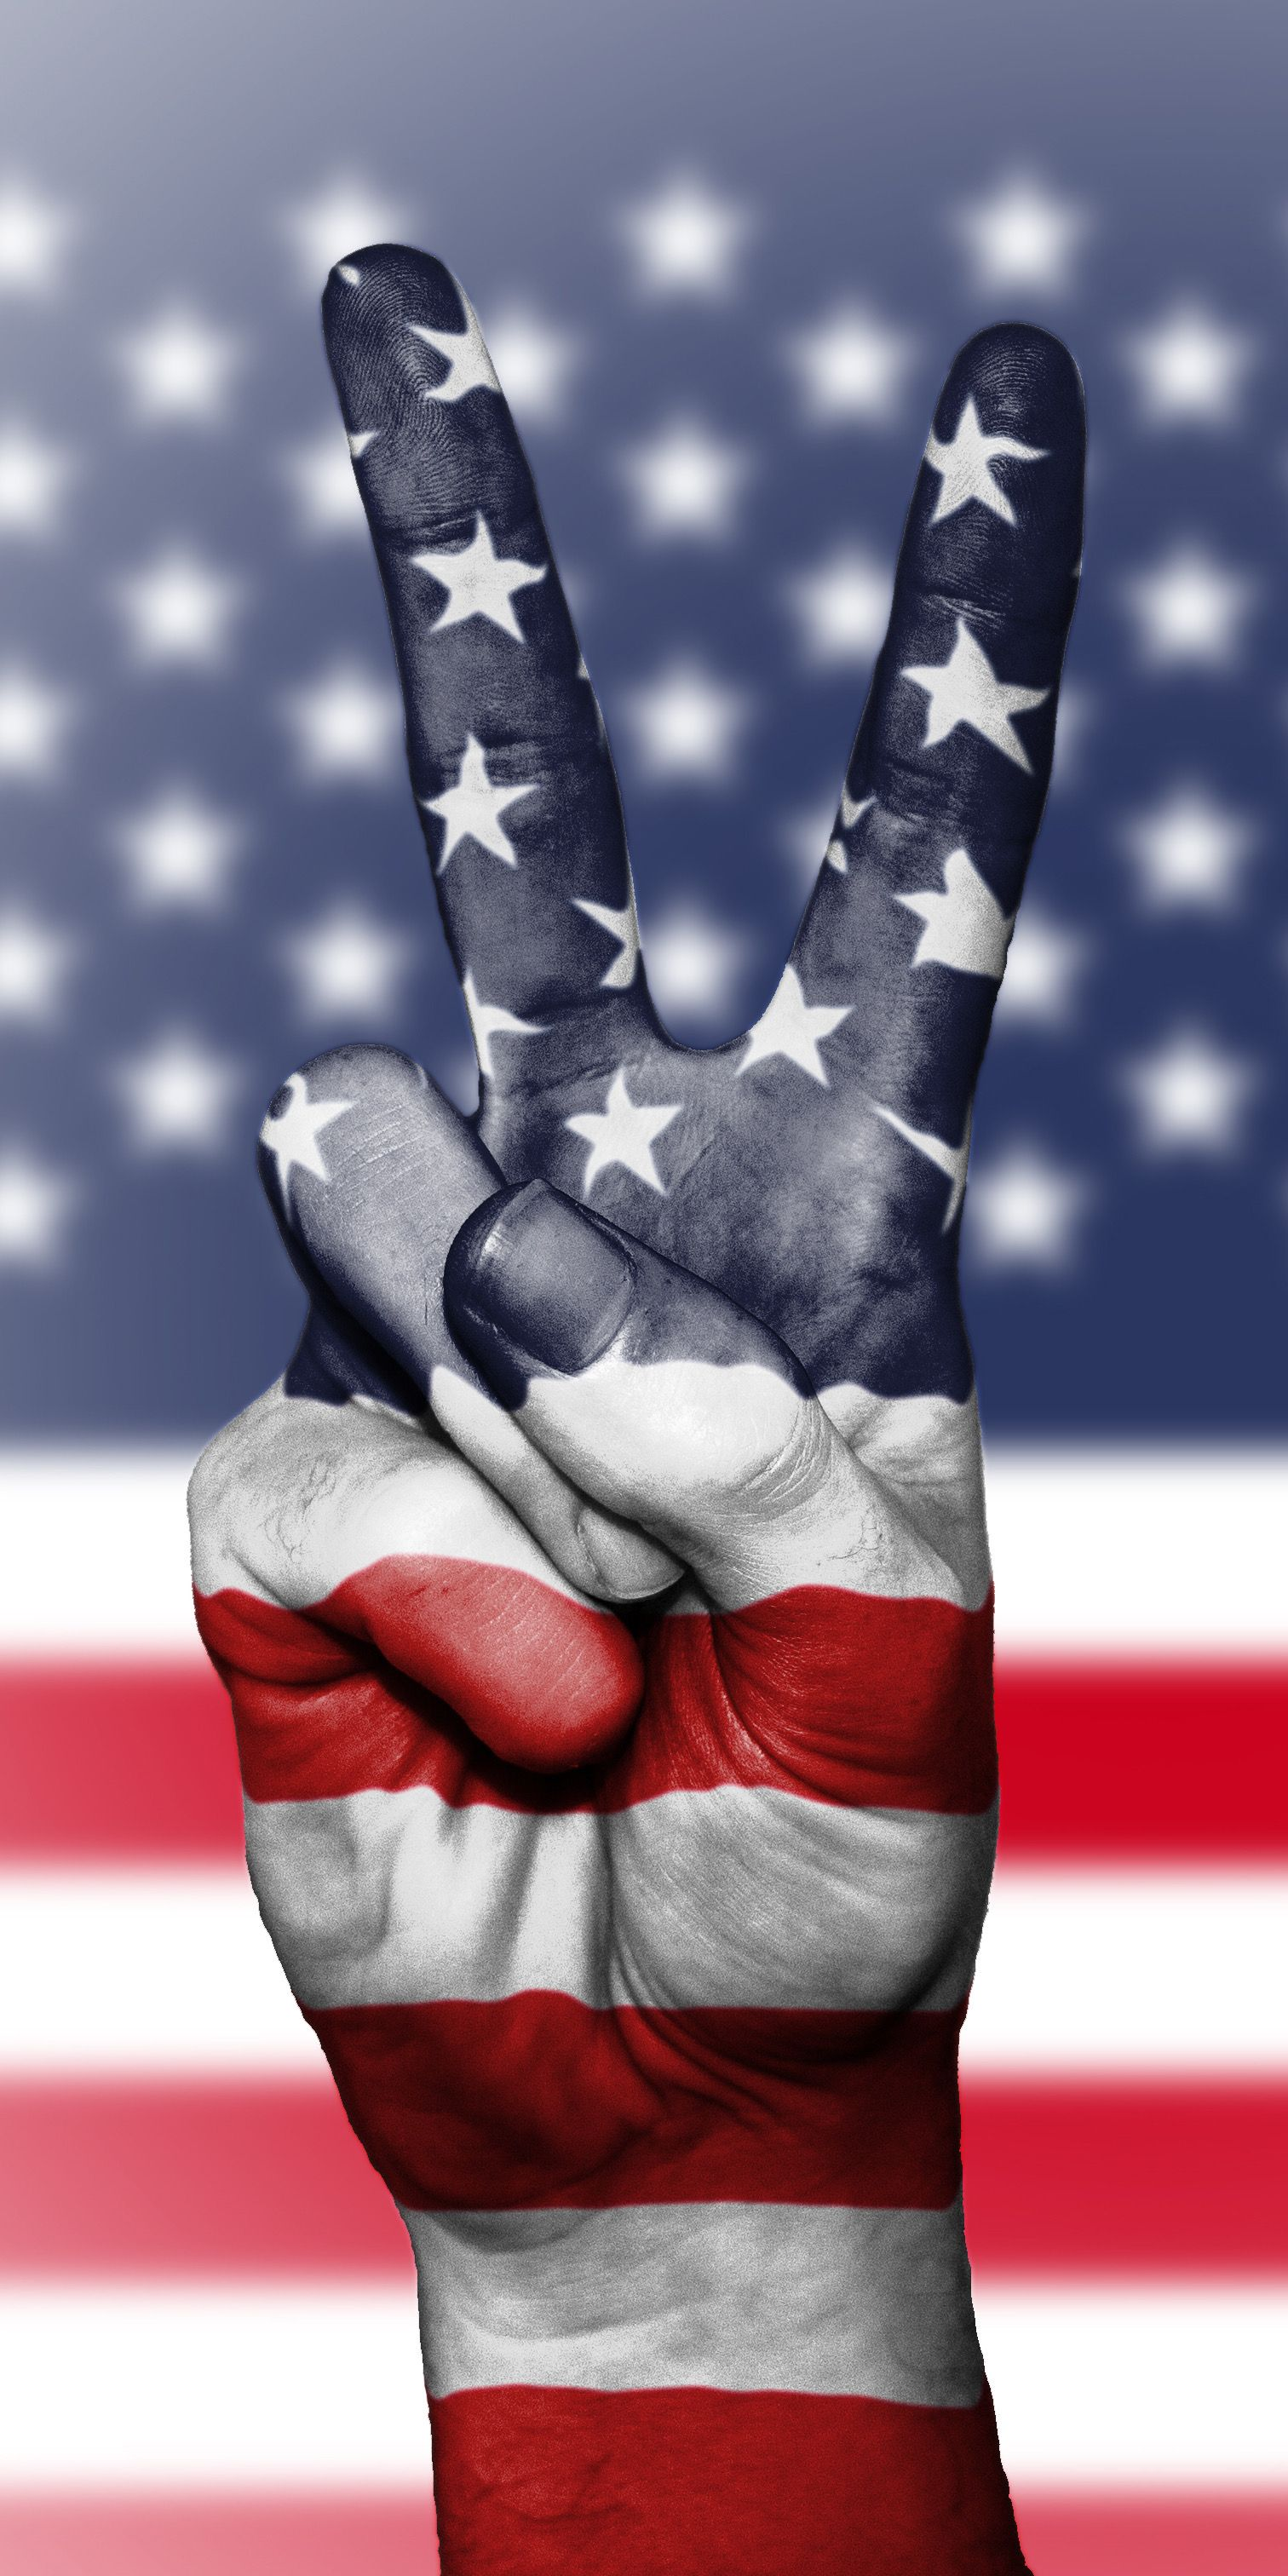 American Flag Peace Sign Wallpaper In 2020 American Flag Wallpaper Usa Flag Wallpaper Patriotic Wallpaper